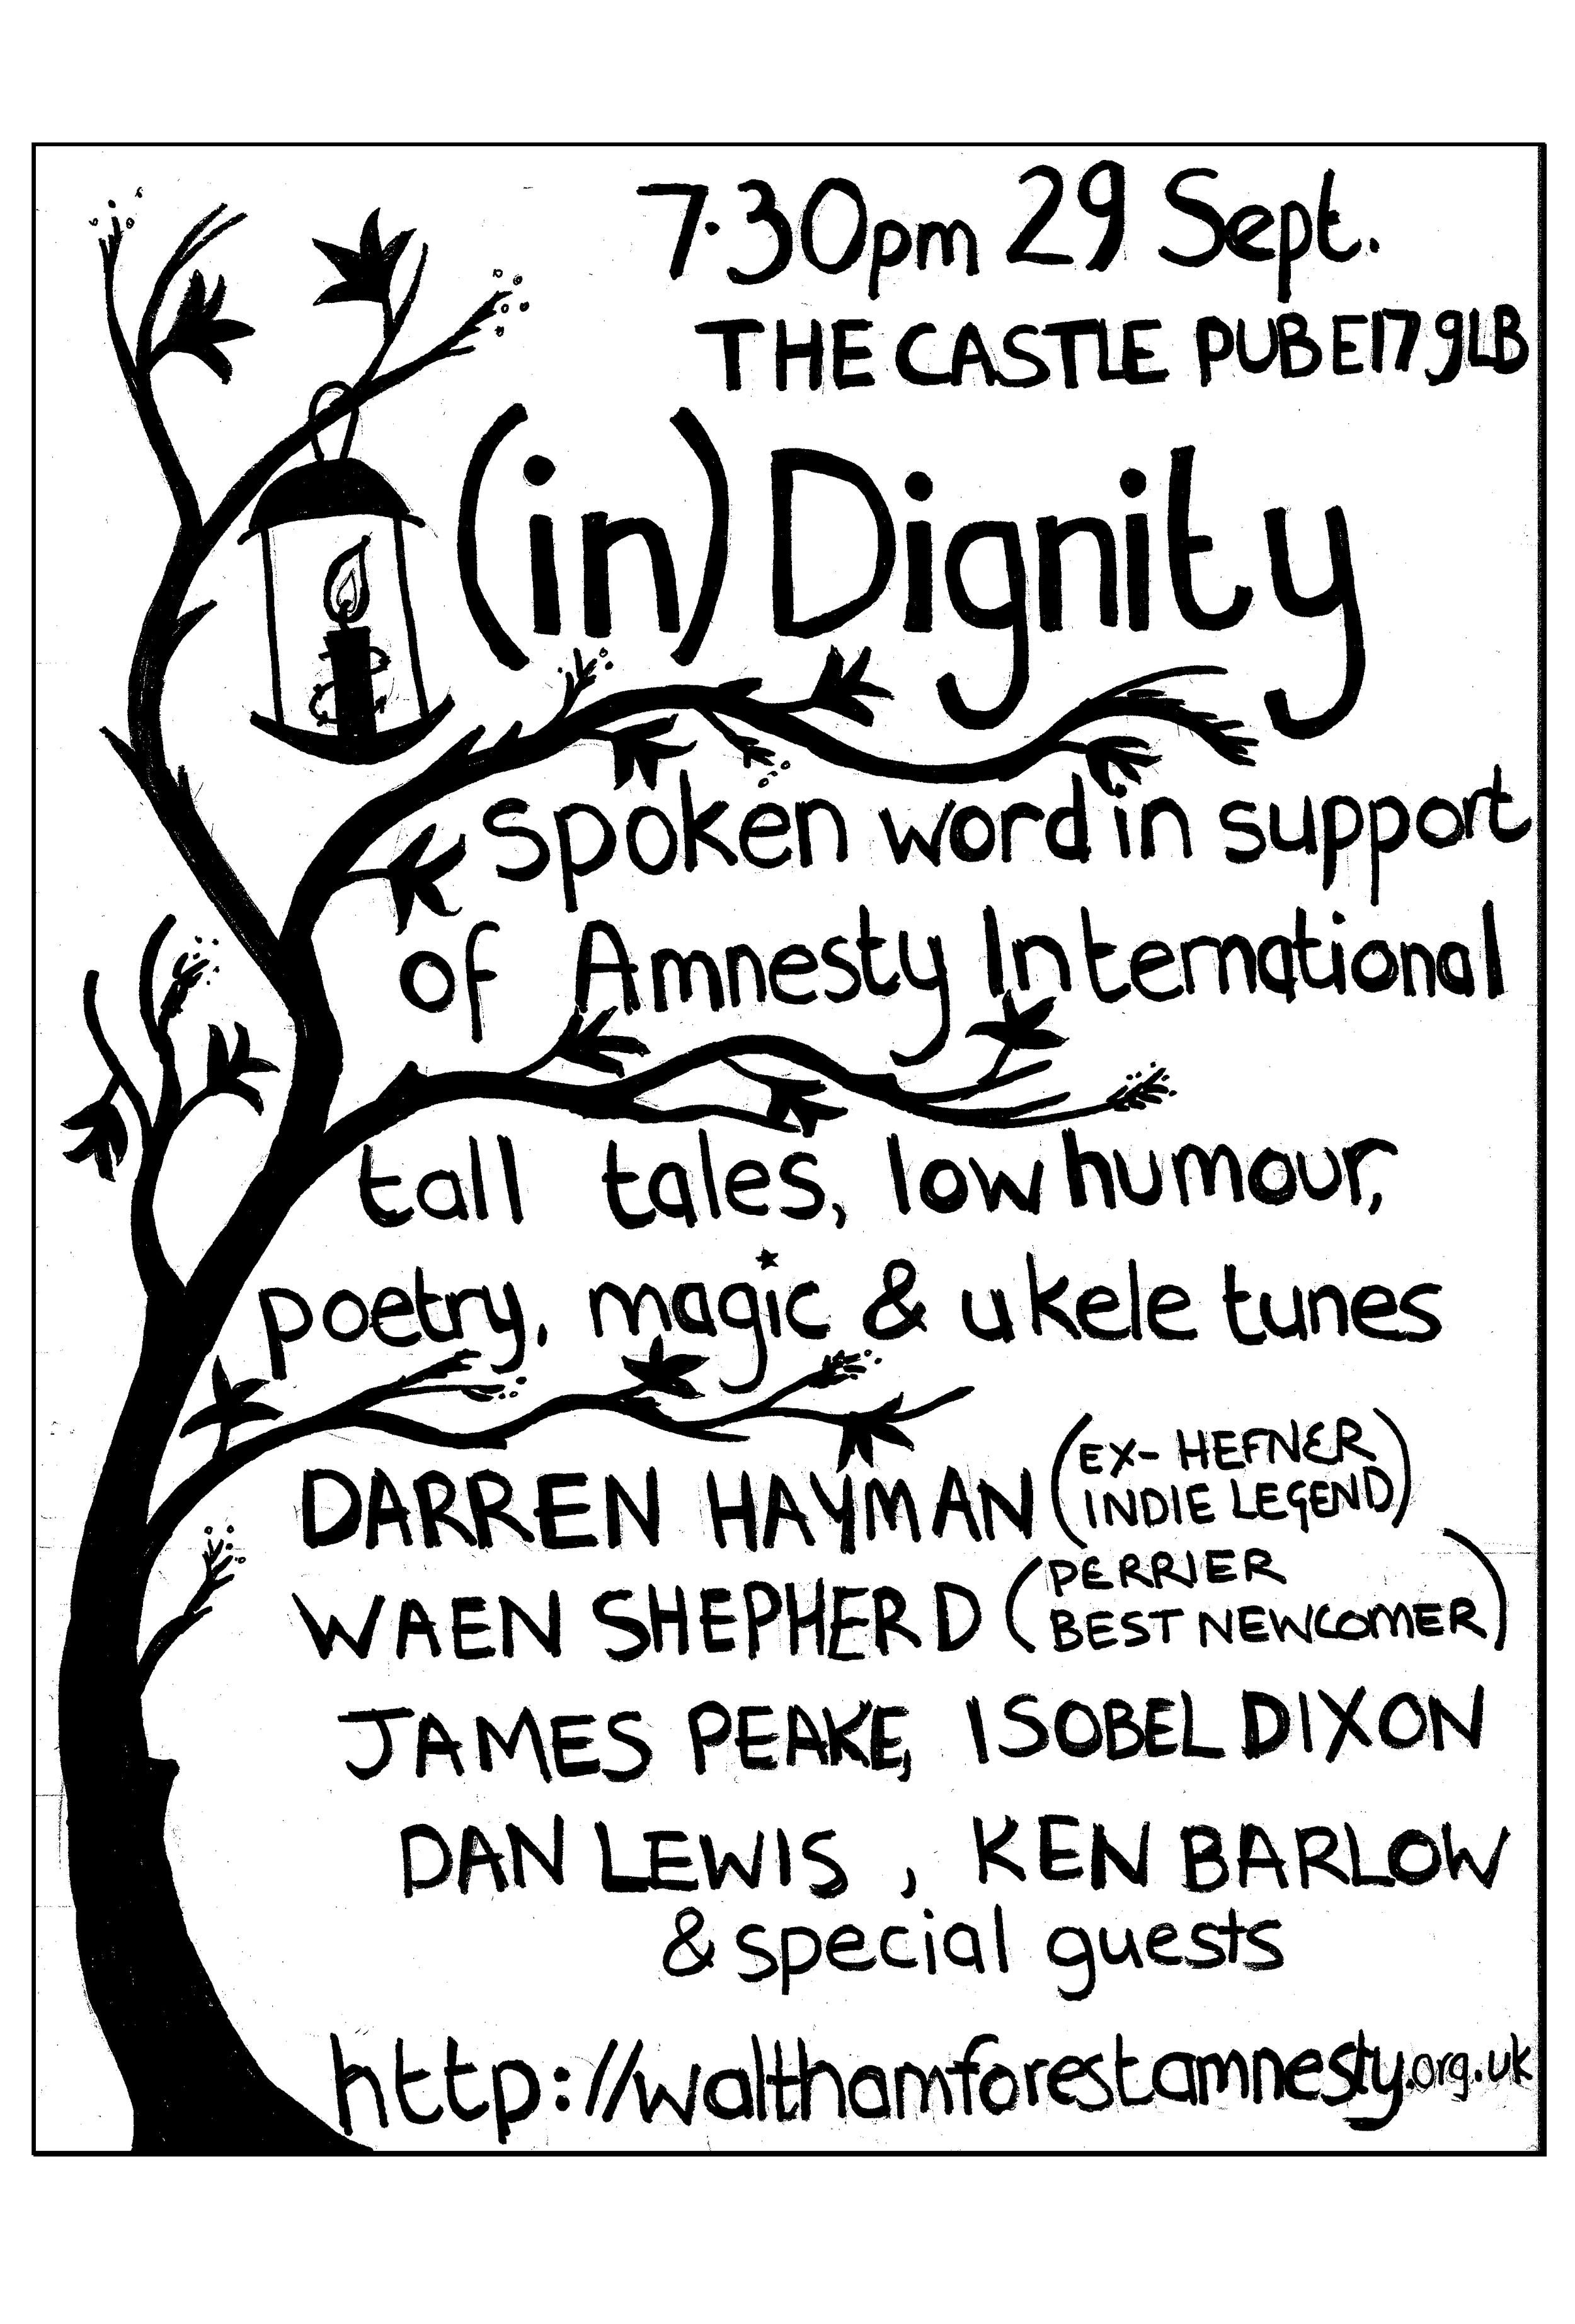 Amnesty International Reading in Walthamstow, 29.9.09